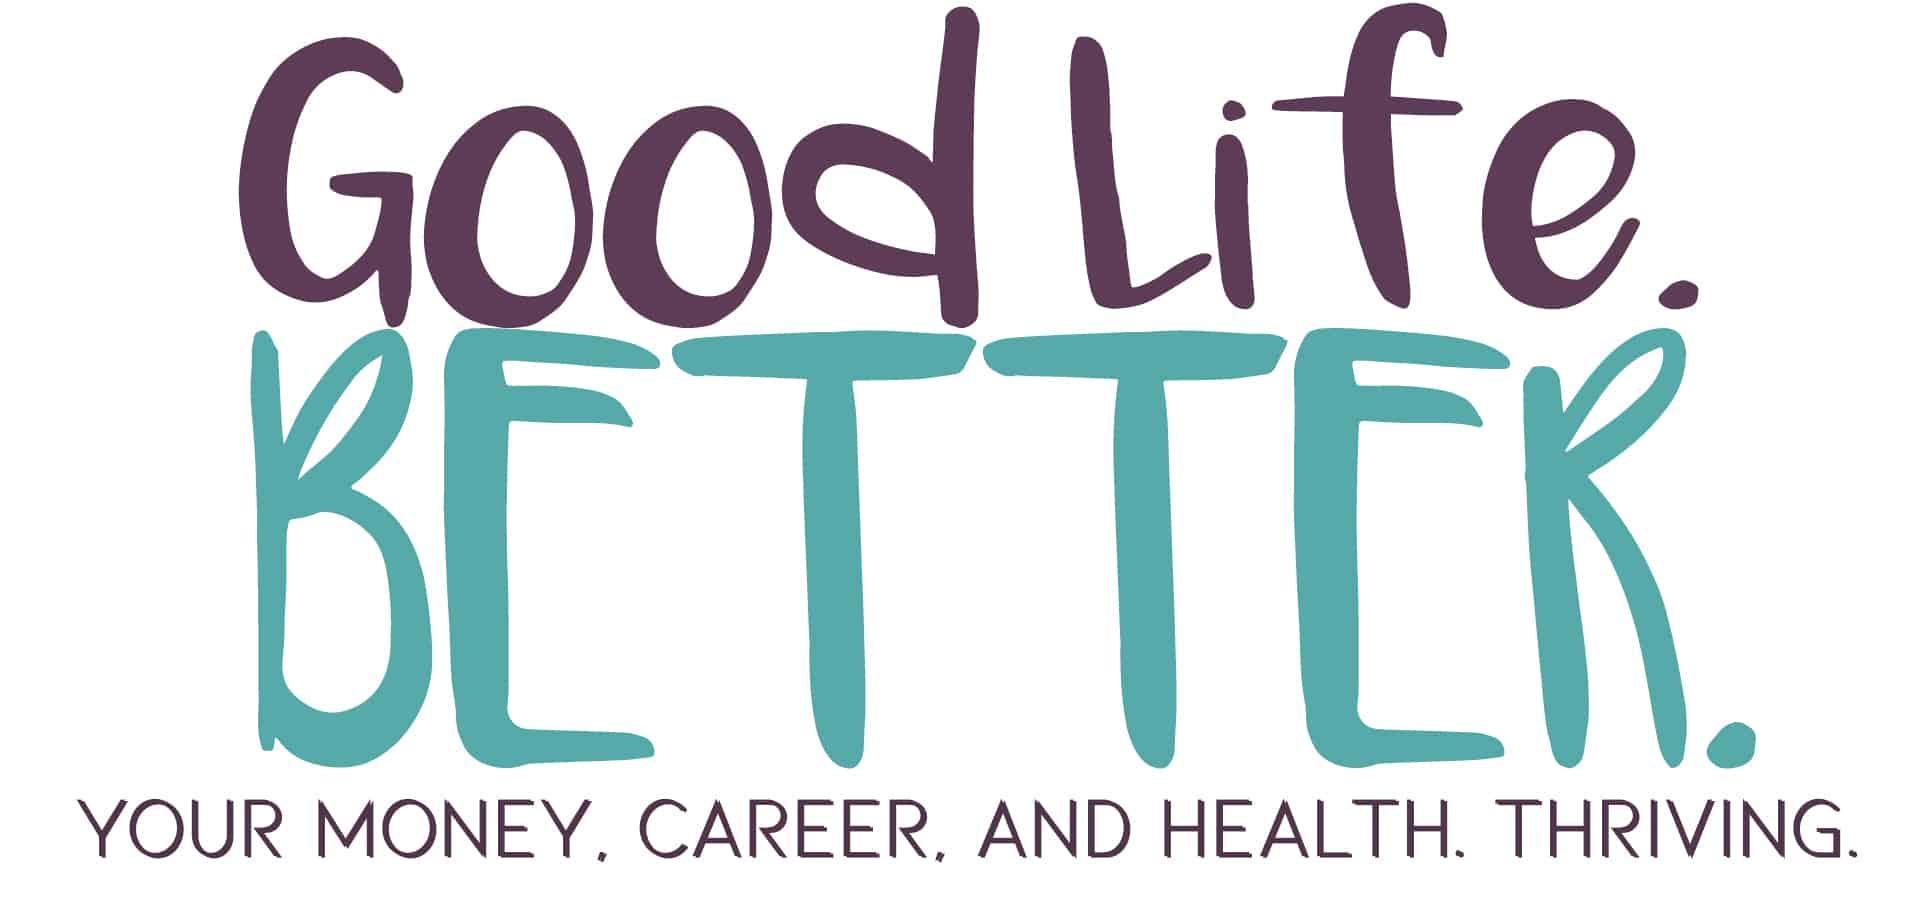 Good Life. Better.